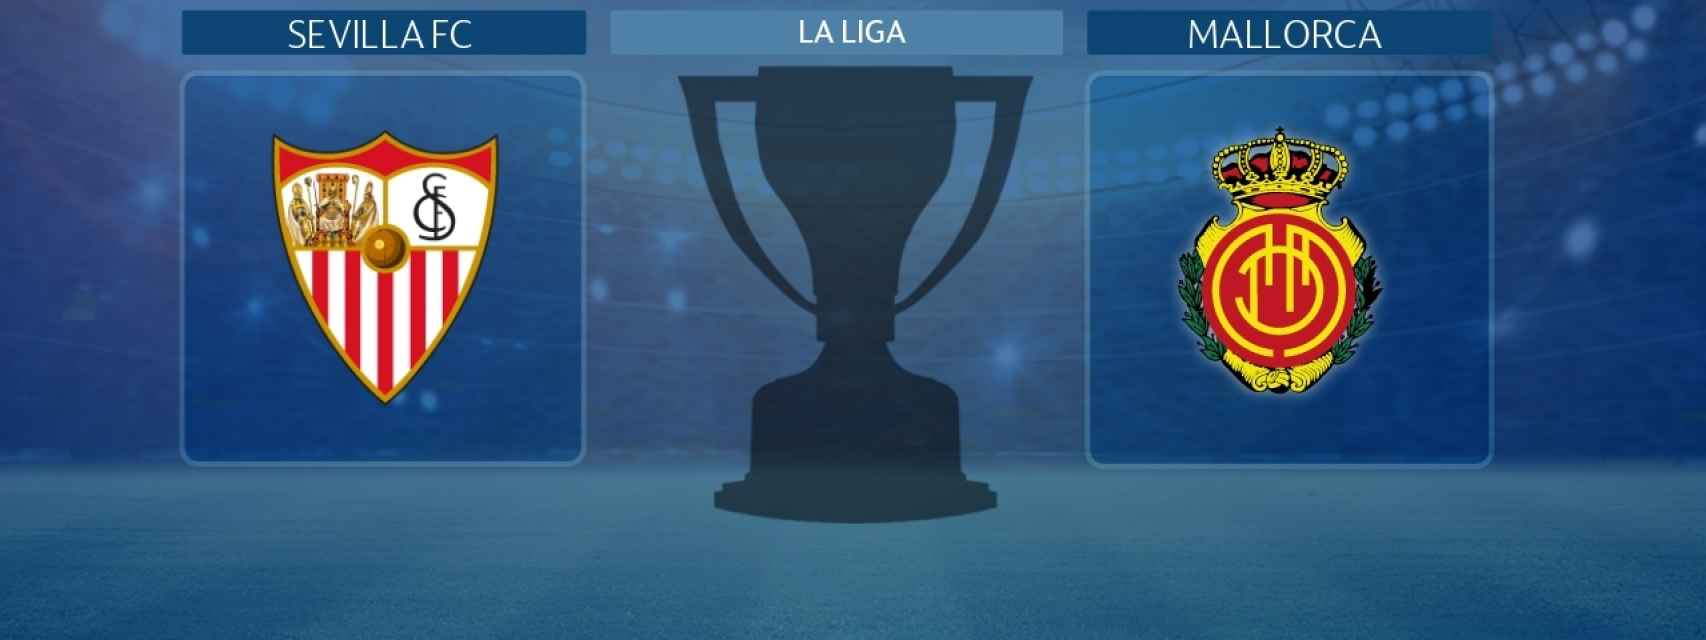 Sevilla - Mallorca, partido de La Liga